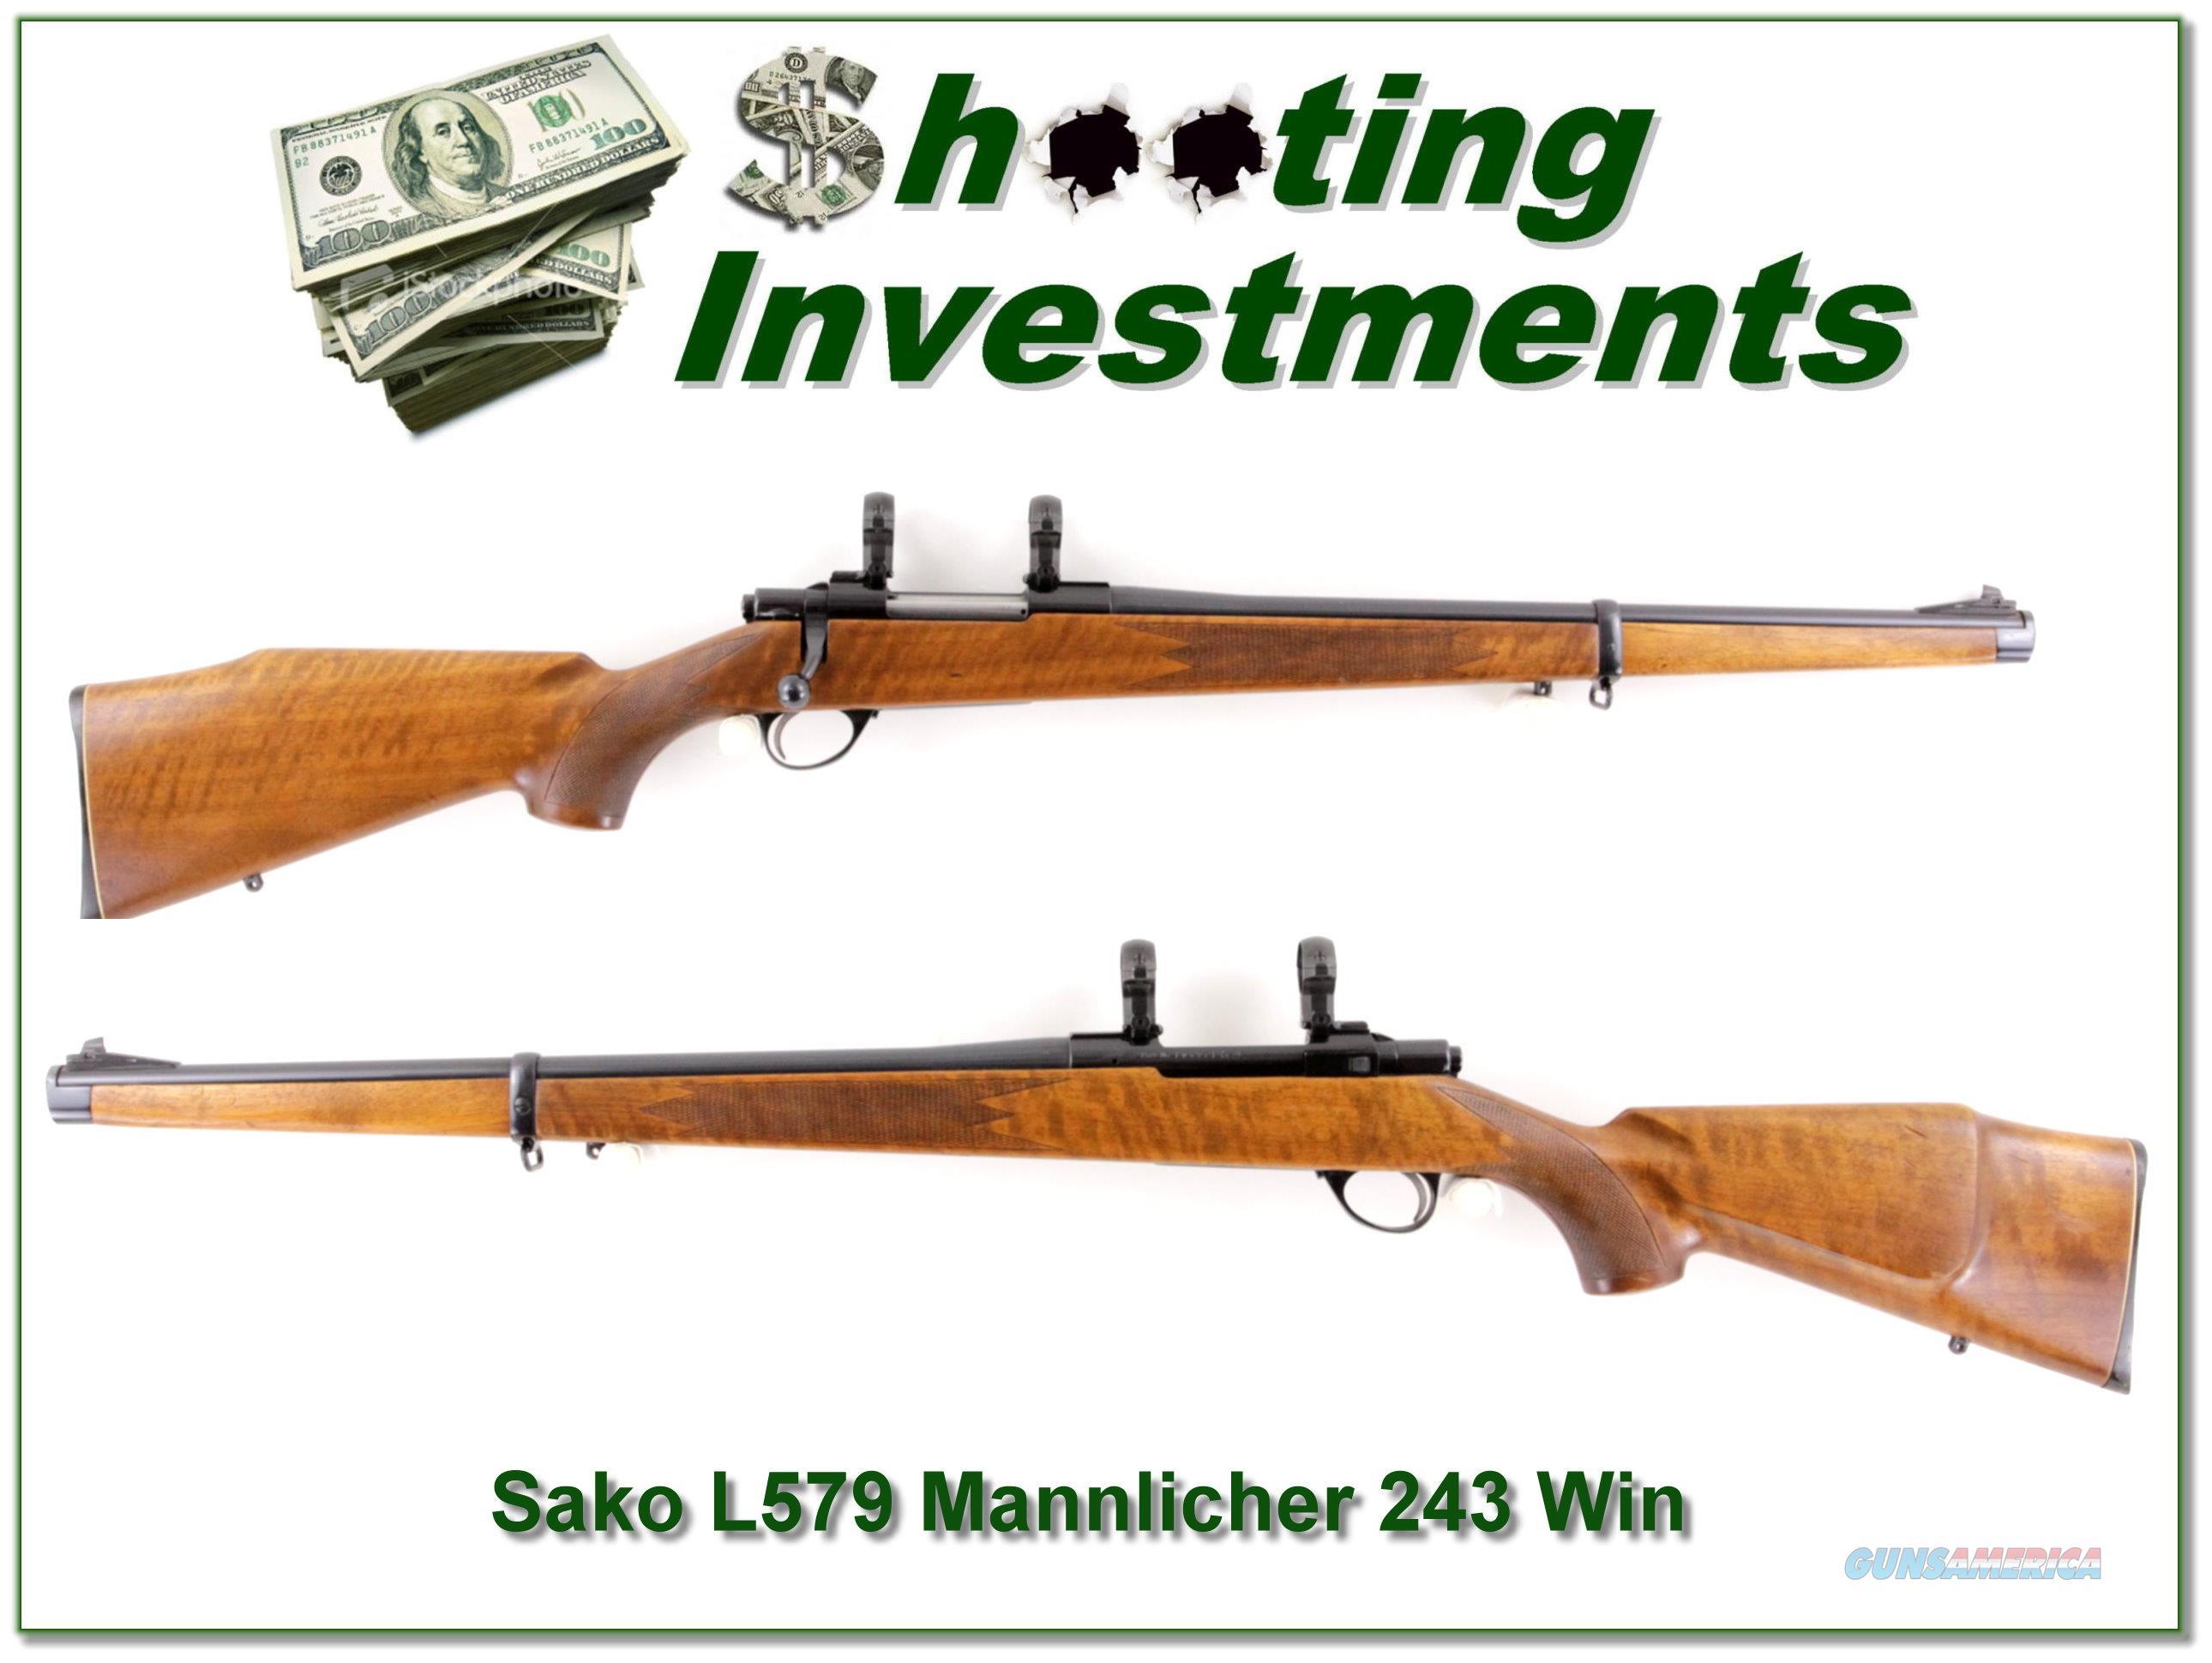 Sako Forester L579 Mannlicher in 243 Winchester  Guns > Rifles > Sako Rifles > Other Bolt Action